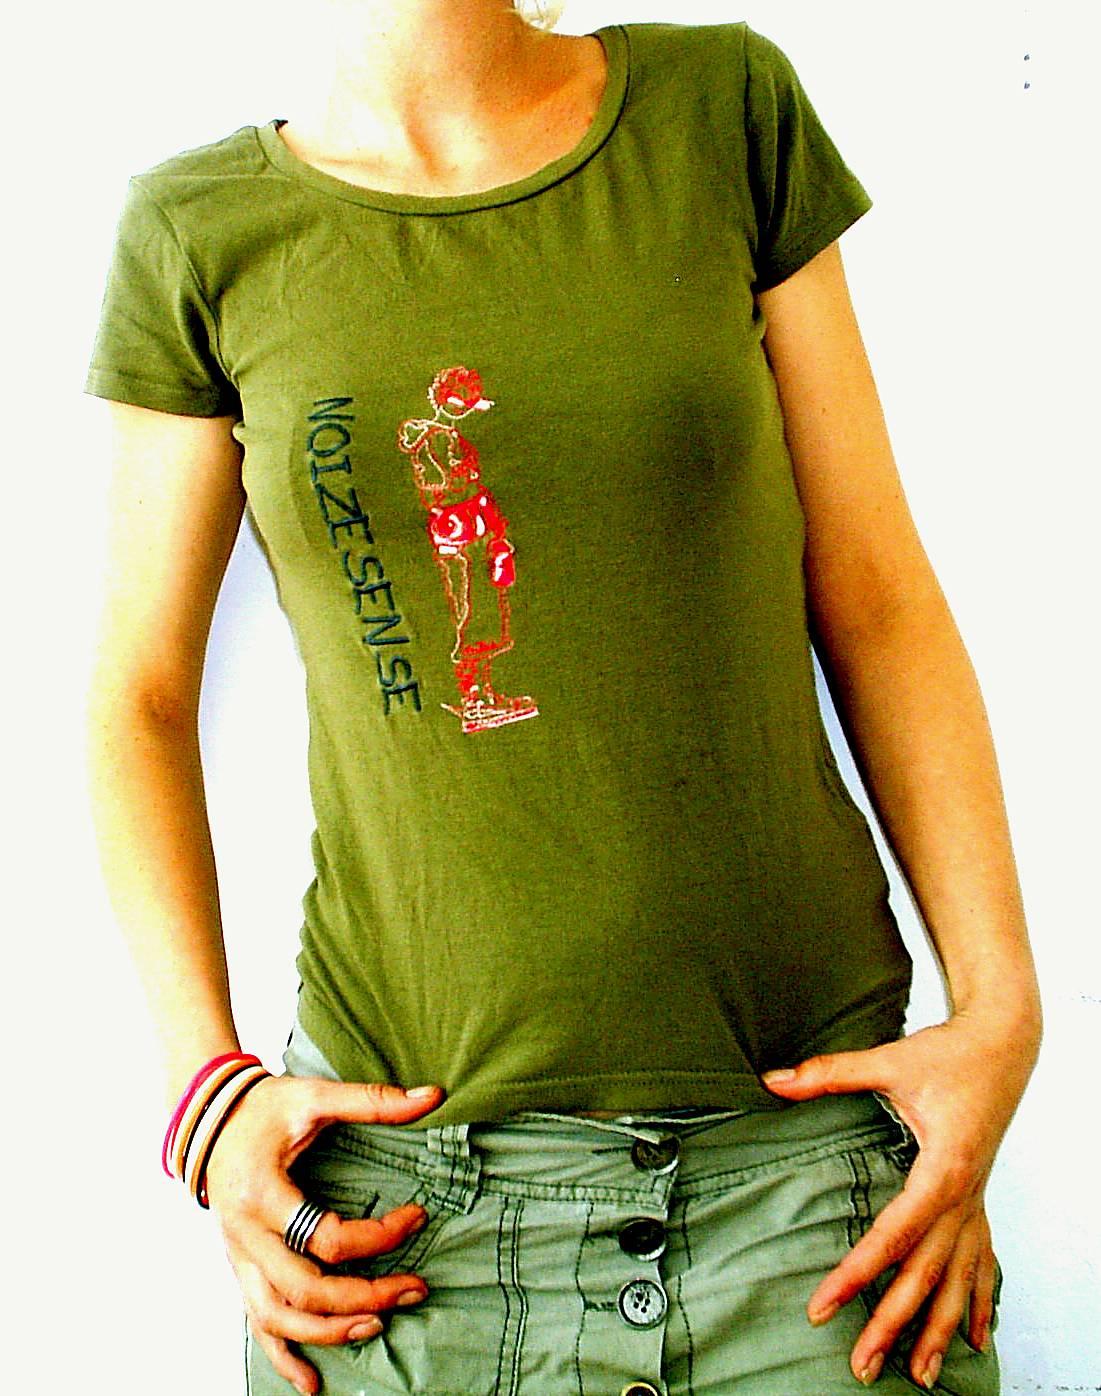 www.noizesense.com